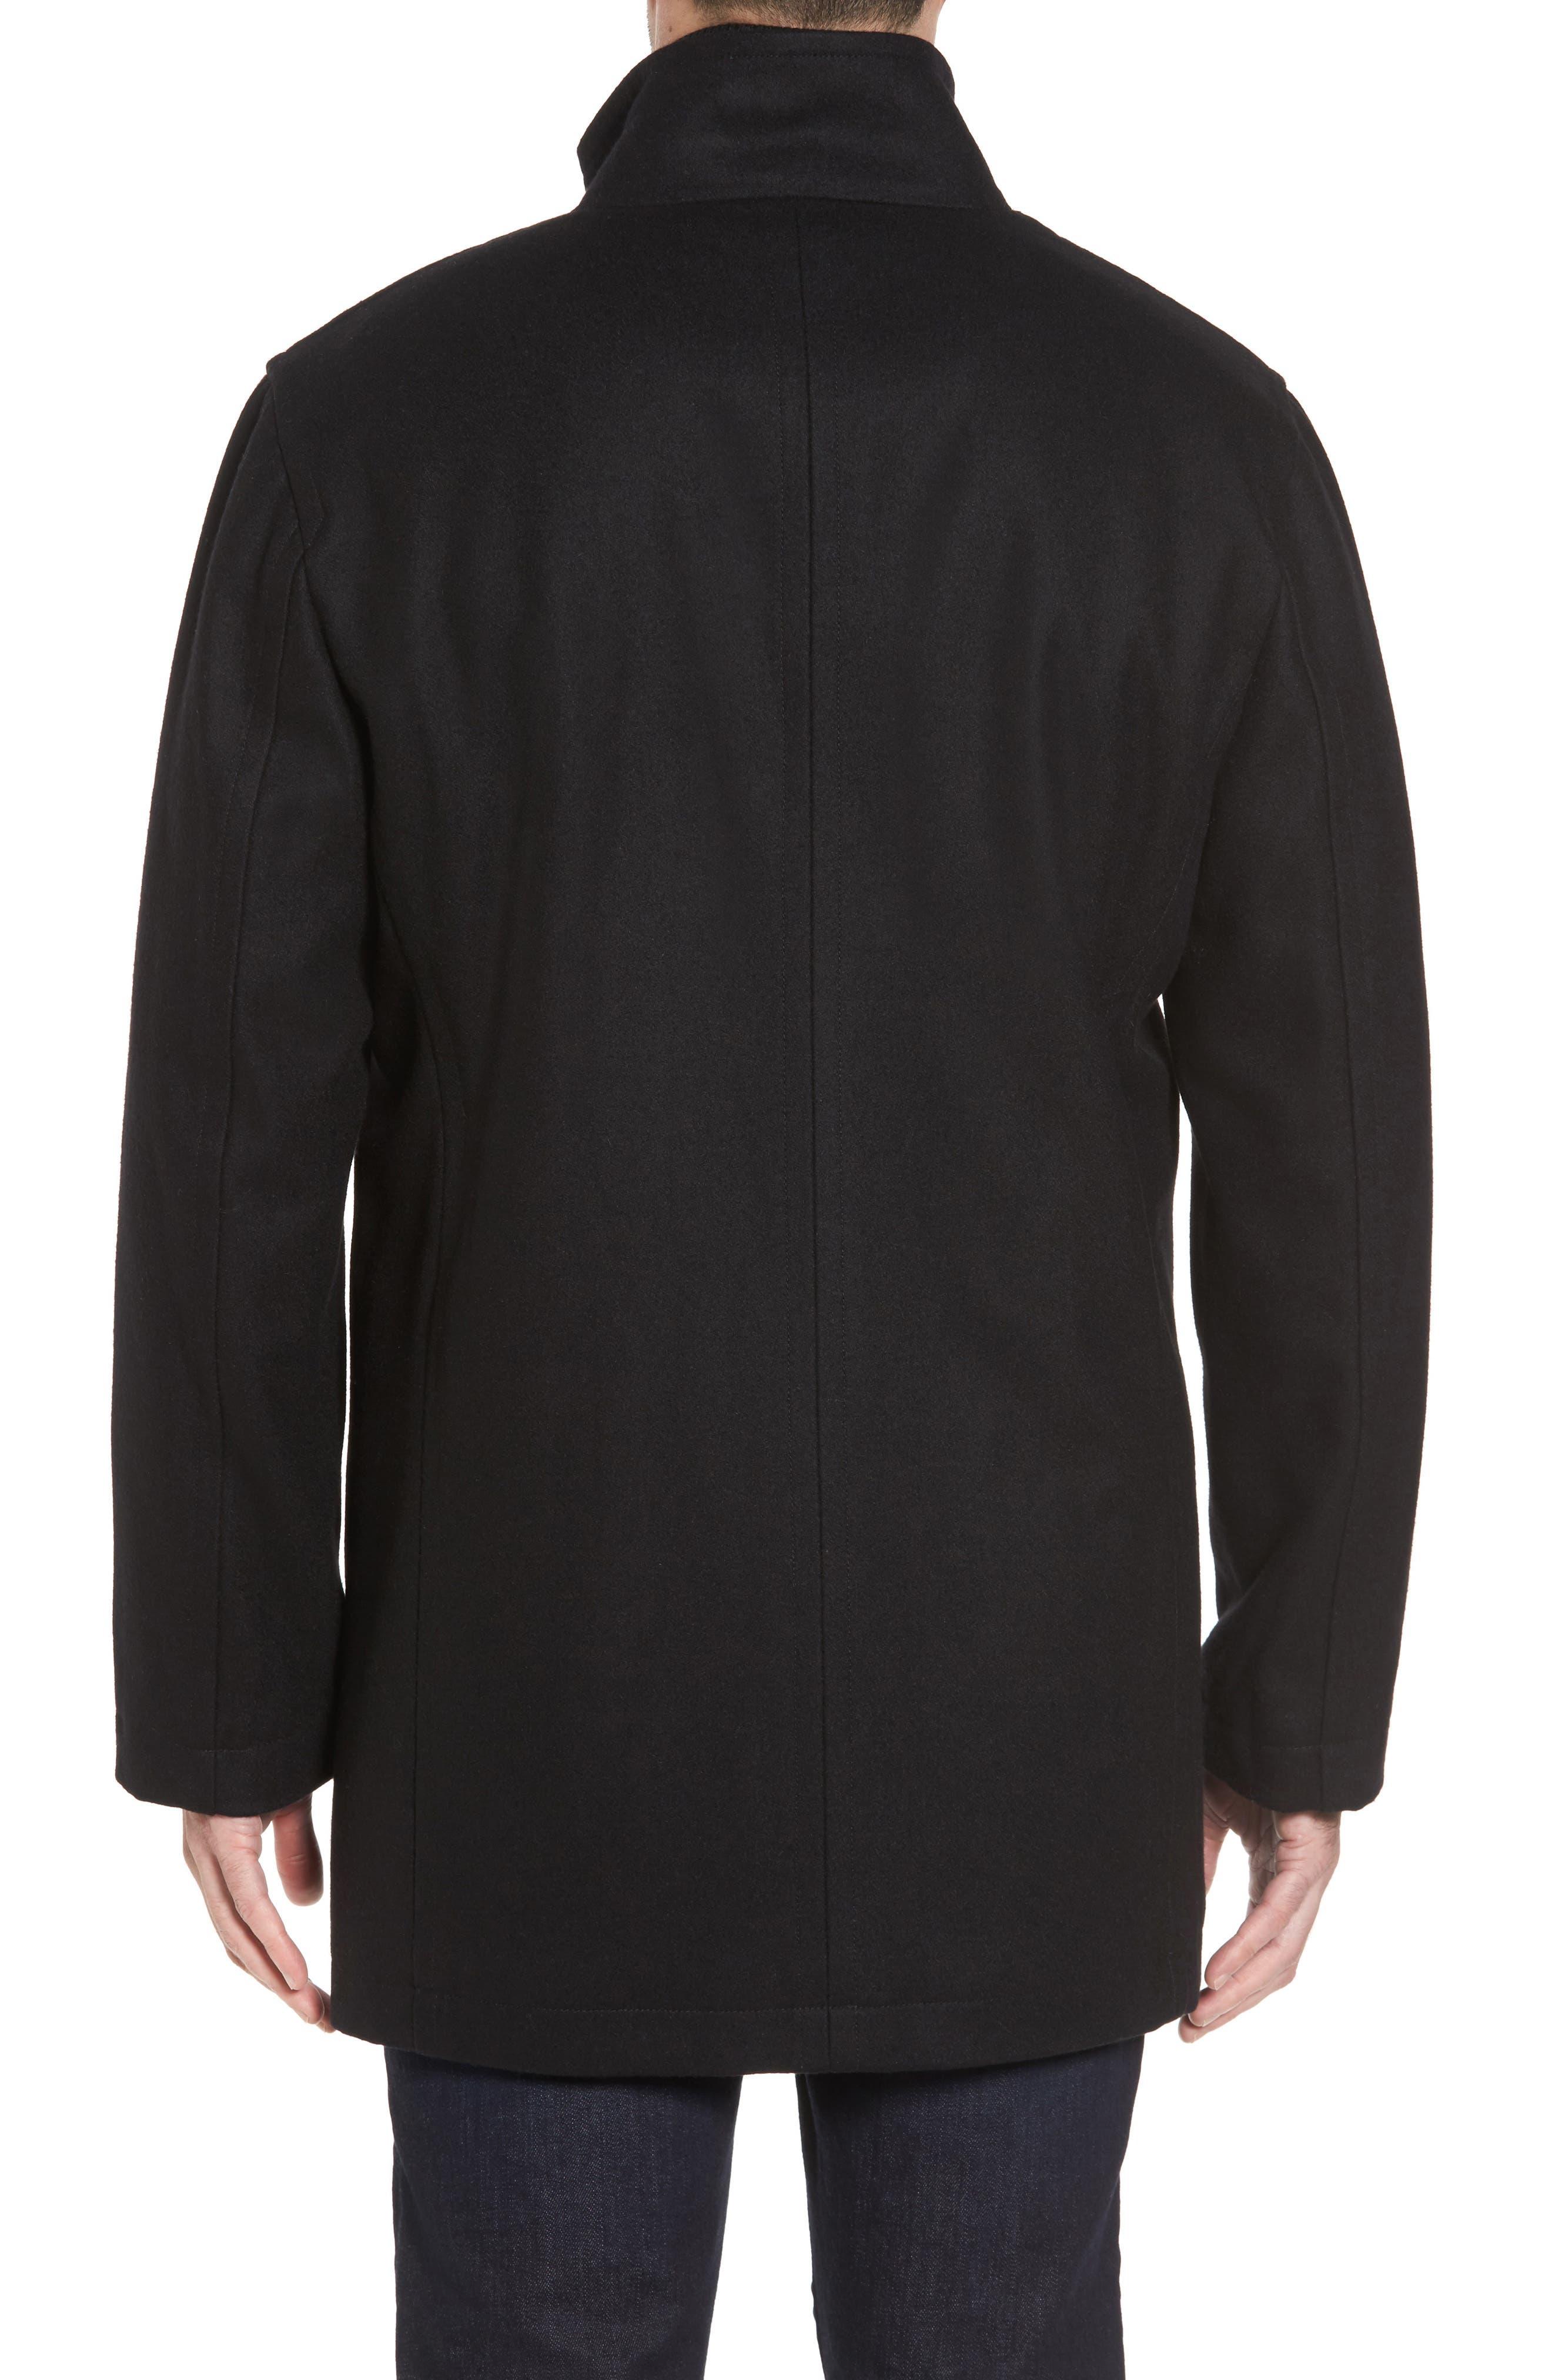 Melton Wool Blend Coat,                             Alternate thumbnail 2, color,                             Black